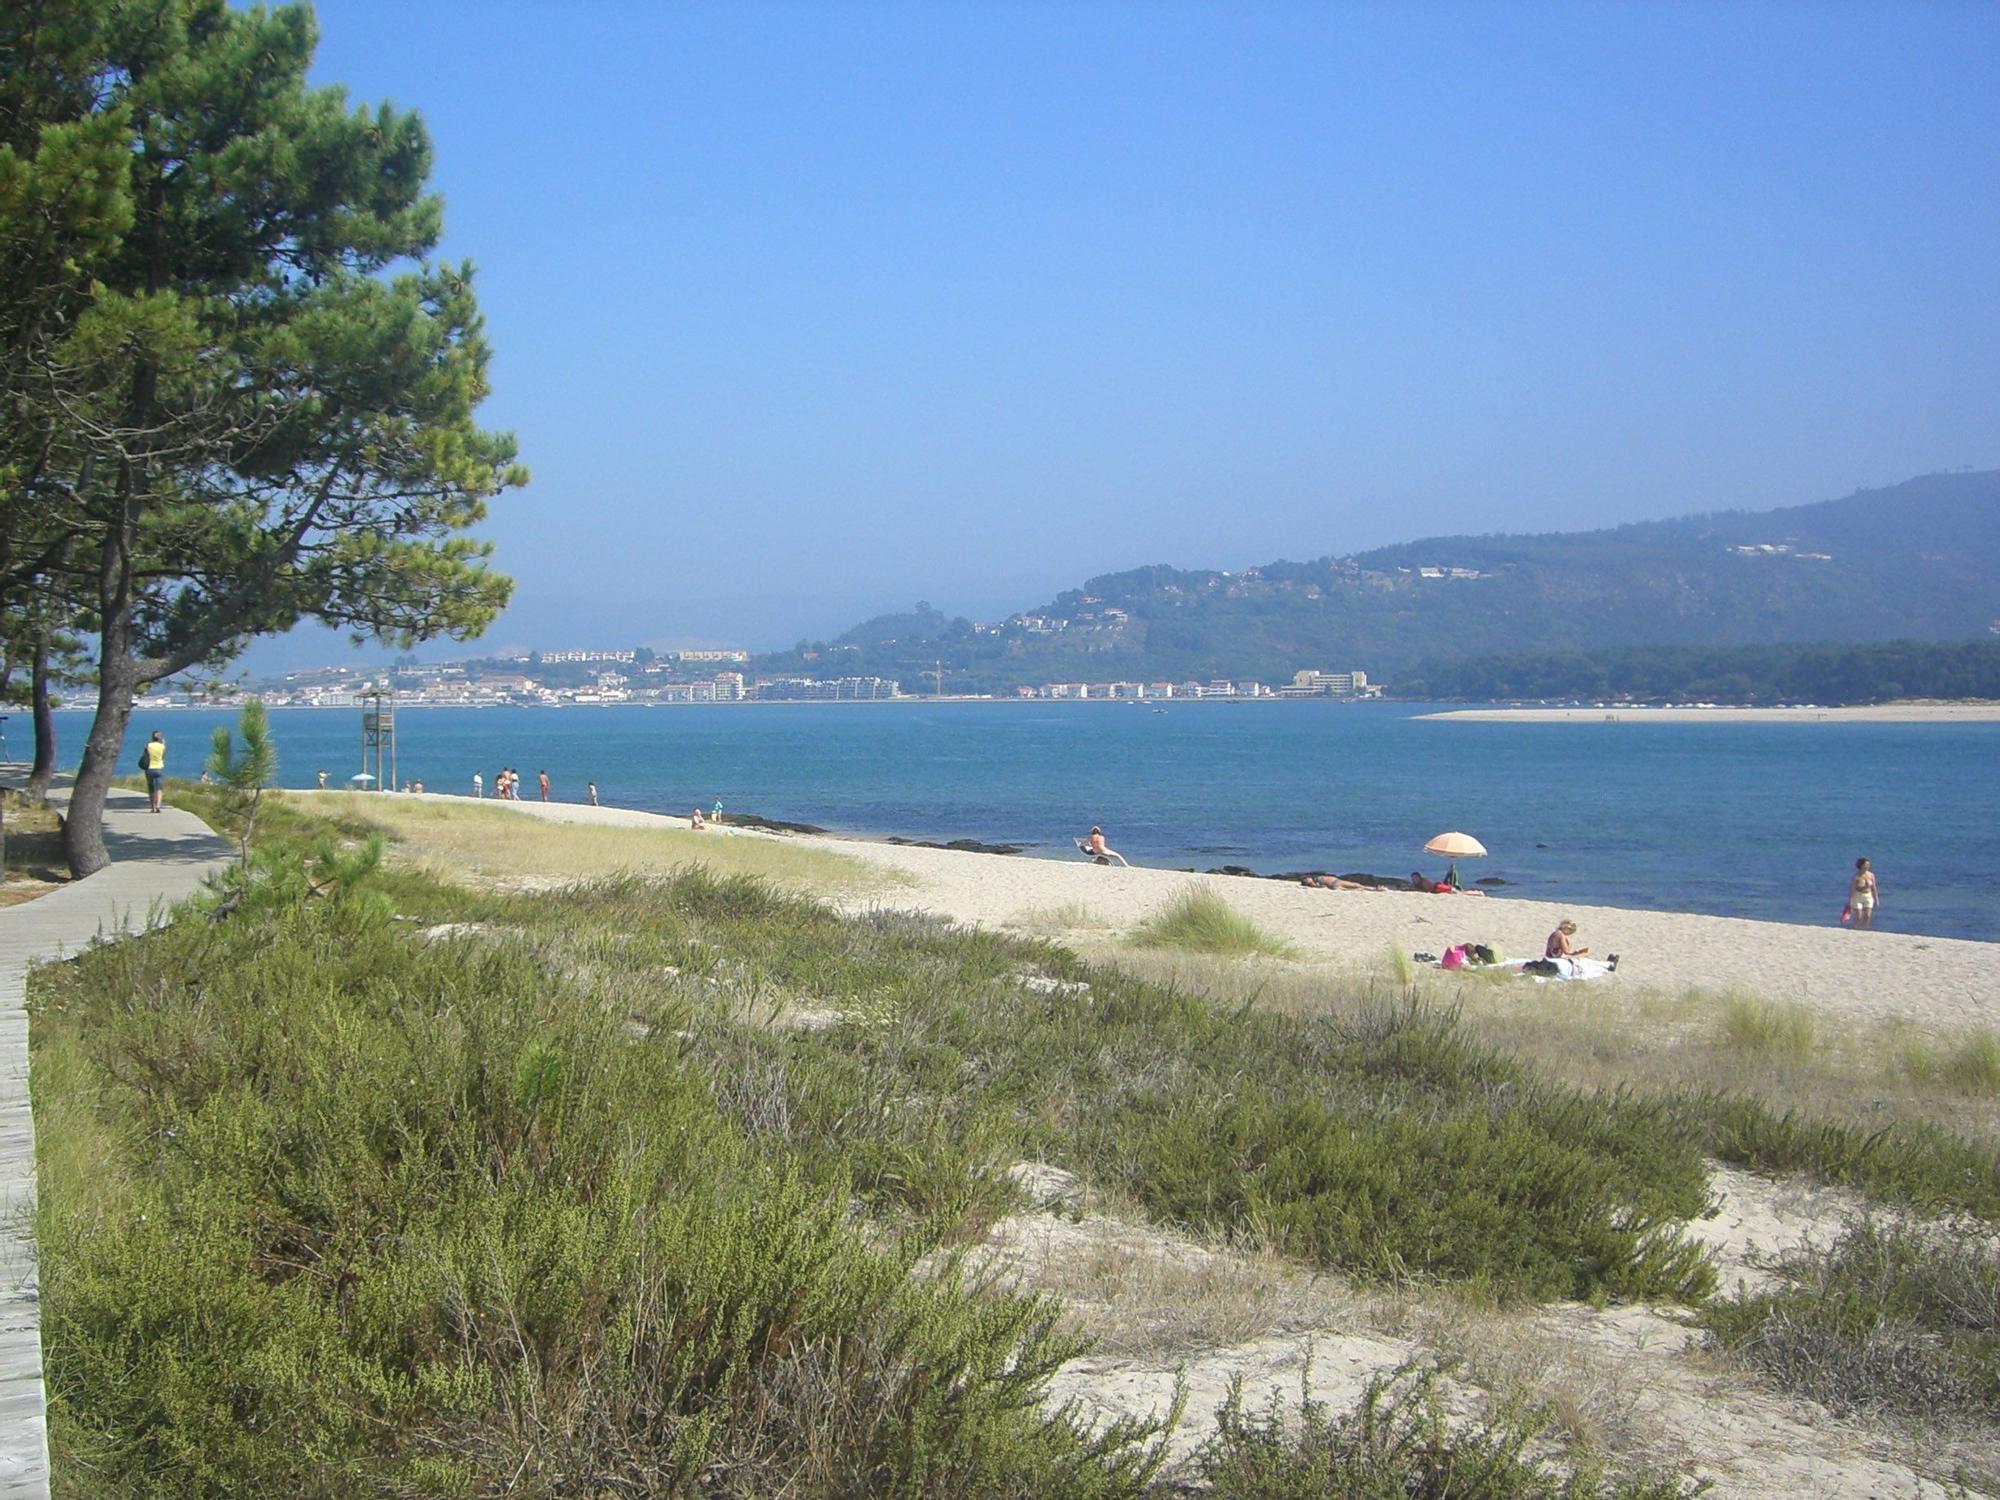 Vista de la Playa de O Muíño / Eva González